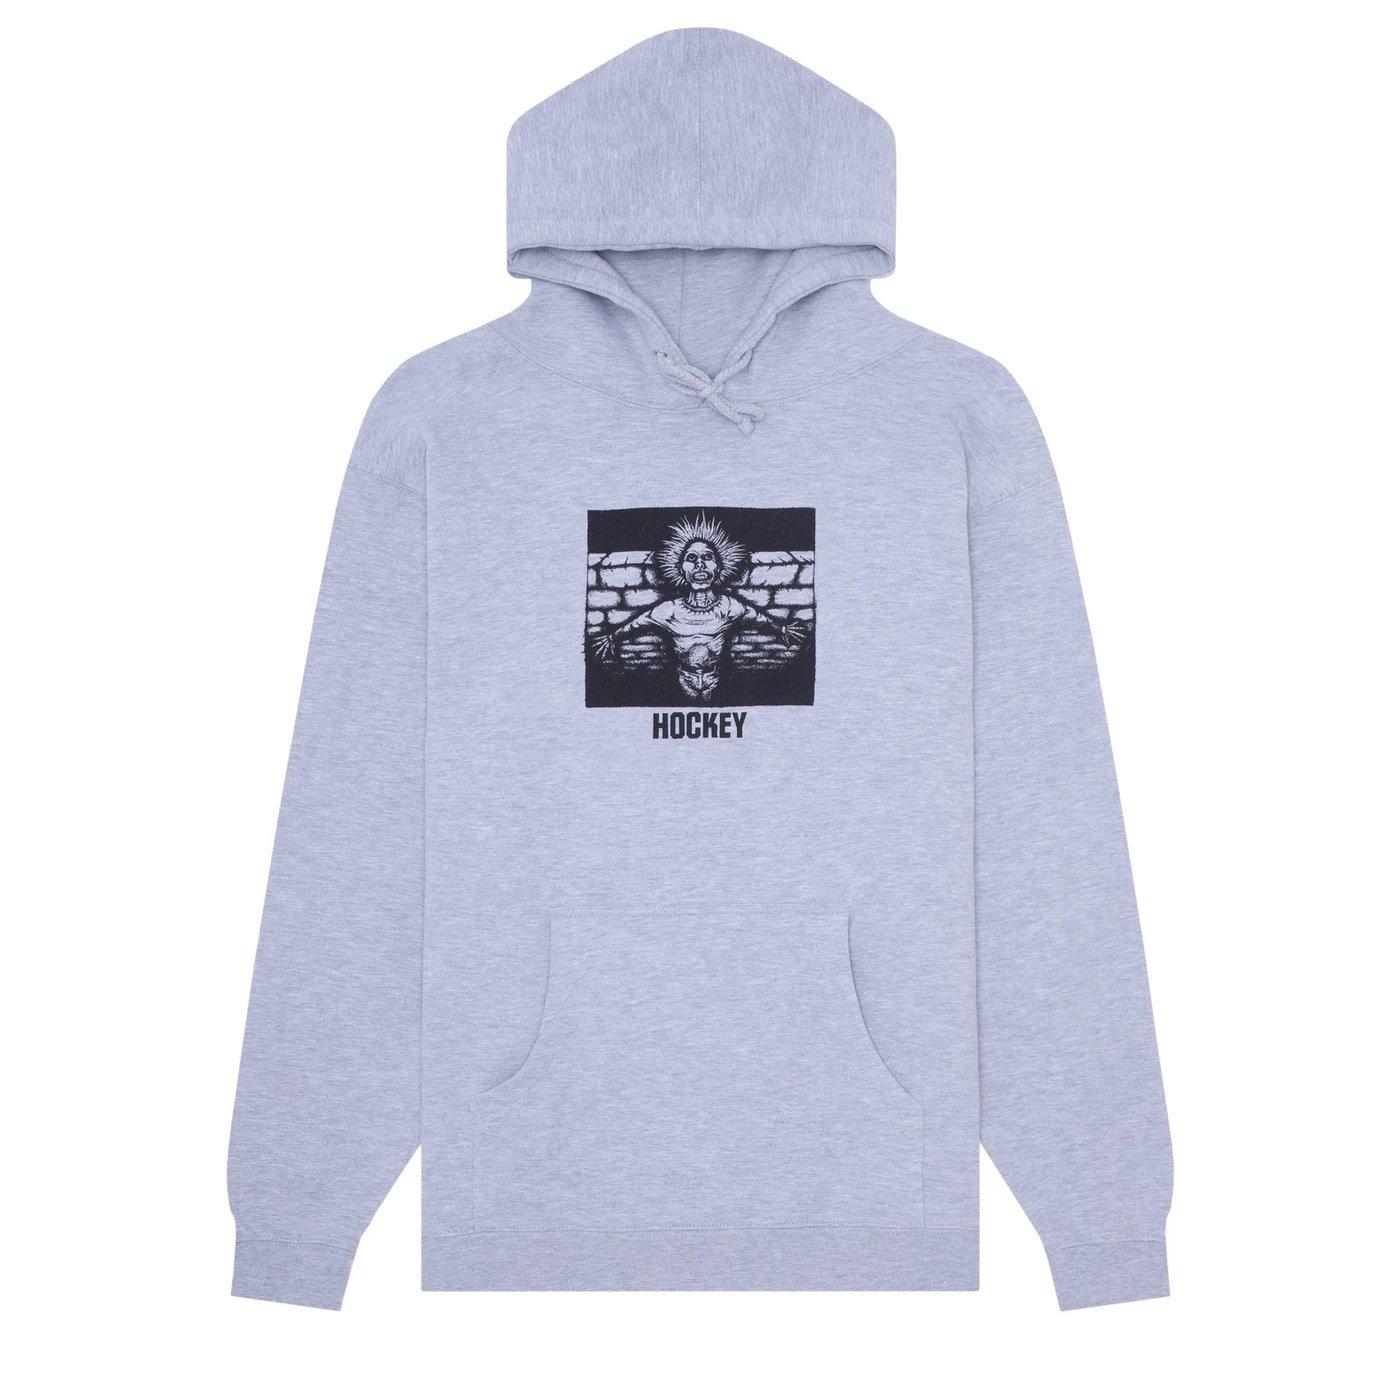 Hockey Nik Stain Crippling Hooded sweatshirt grey heather